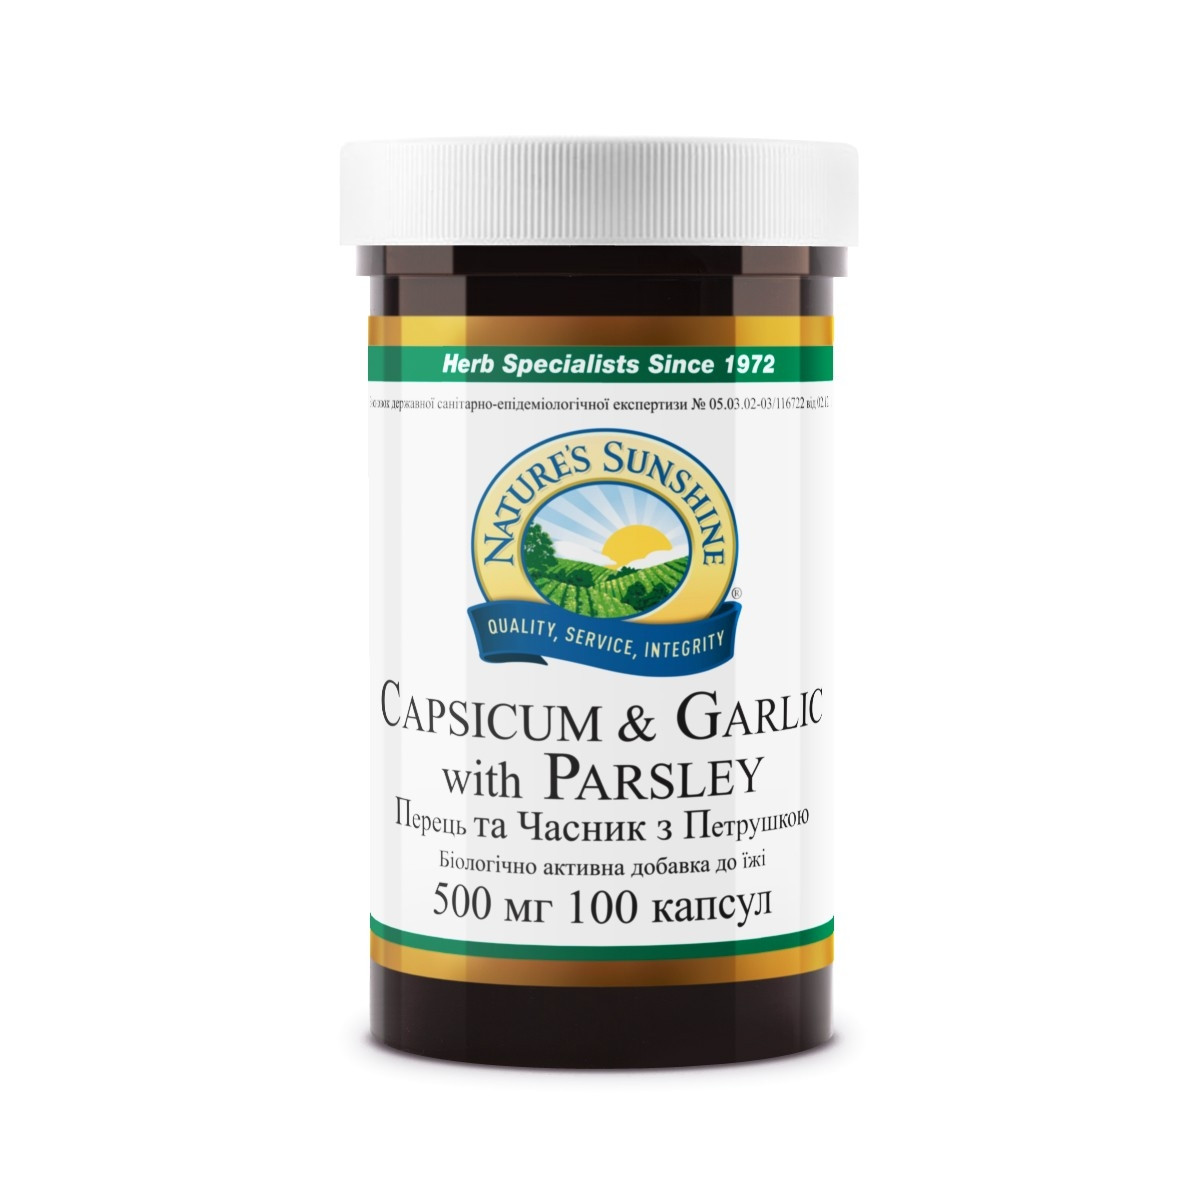 Перец, Чеснок, Петрушка Capsicum & Garlic with Parsley,  NSP, США